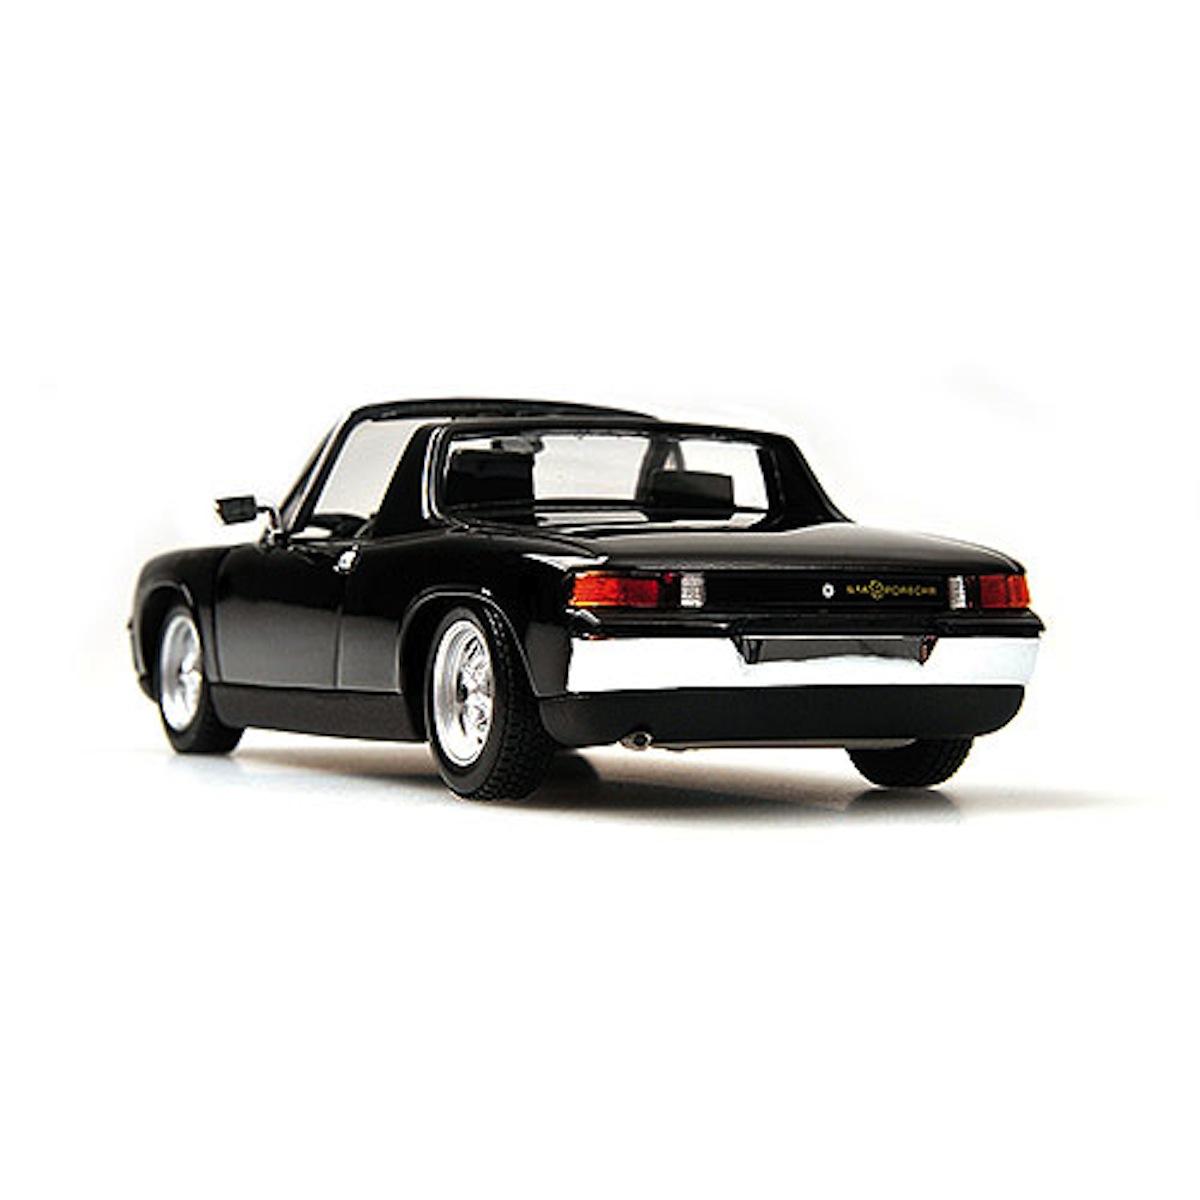 Porsche 914//4 1973-negro-Minichamps 1:43-430065671